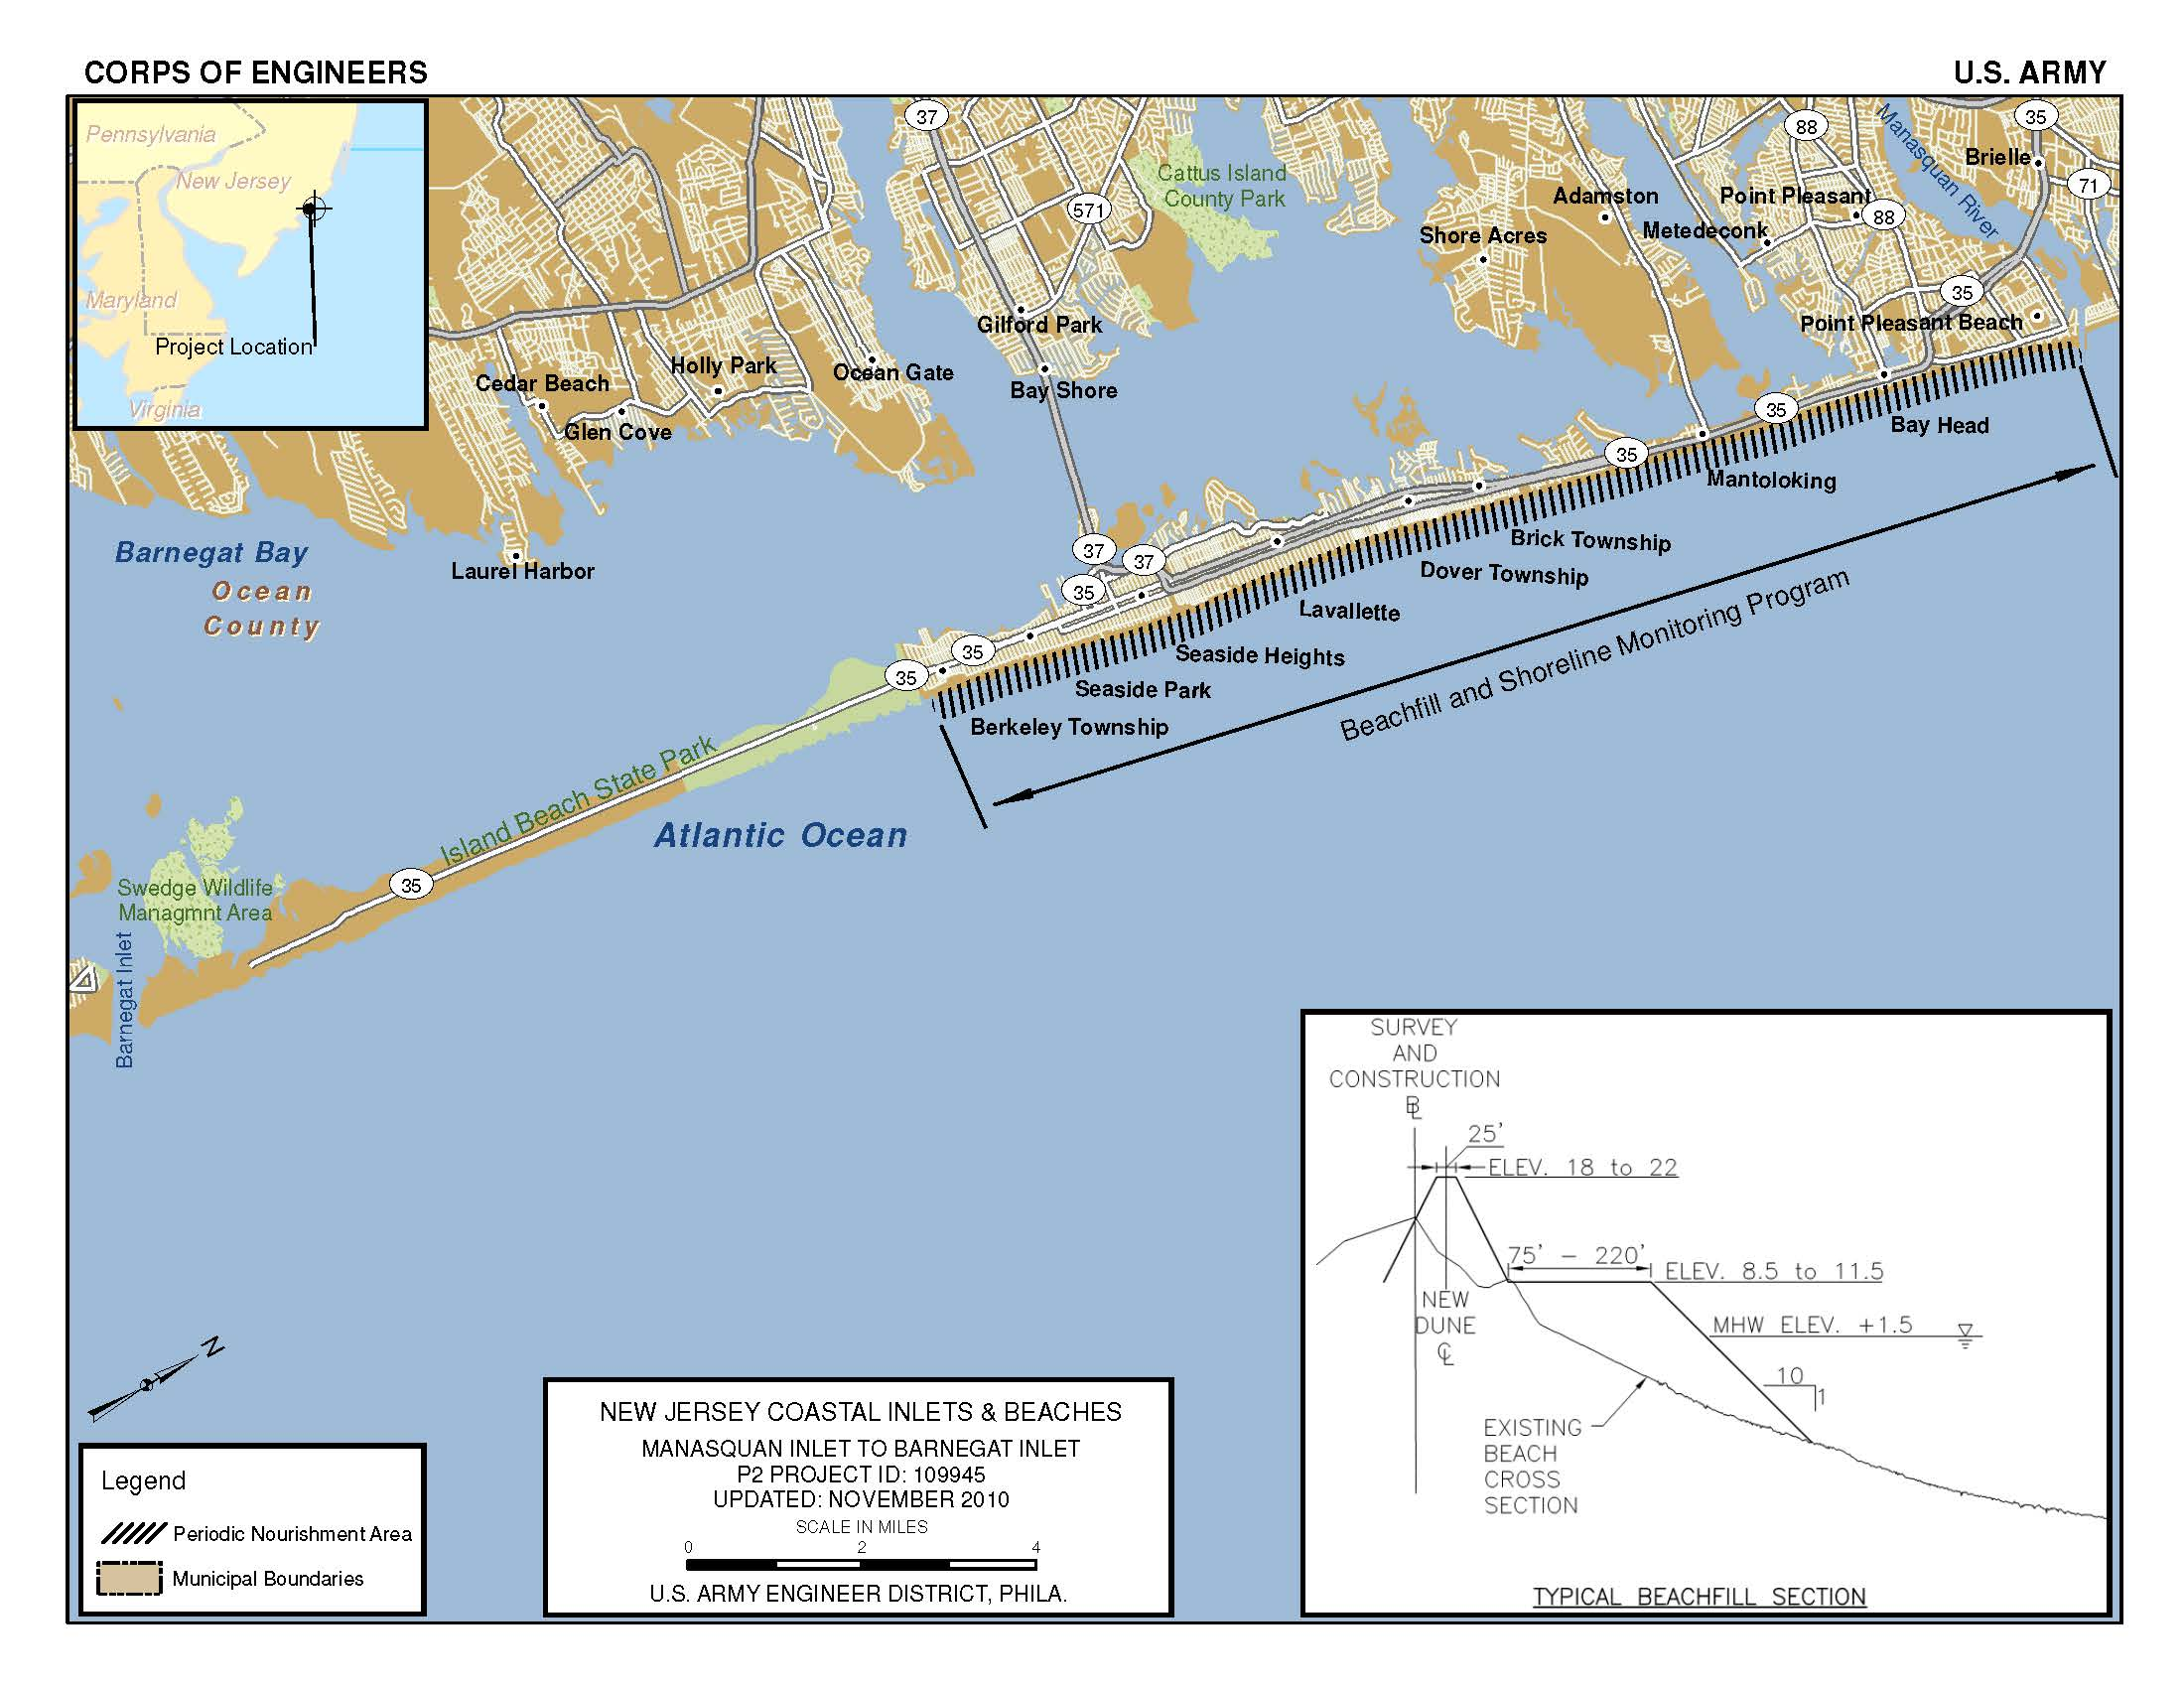 Army Corp of Engineers Project   Seaside Heights Borough, NJ Seaside Nj Map on redding nj map, pittsburgh nj map, hawthorne nj map, salem nj map, springfield nj map, fairview nj map, washington county nj map, medford nj map, richmond nj map, orange nj map, jersey shore map, newport nj map, new jersey coast map, radburn nj map, crater lake nj map, florence nj map, great falls nj map, avon nj map, nj beach map, spring lake nj map,